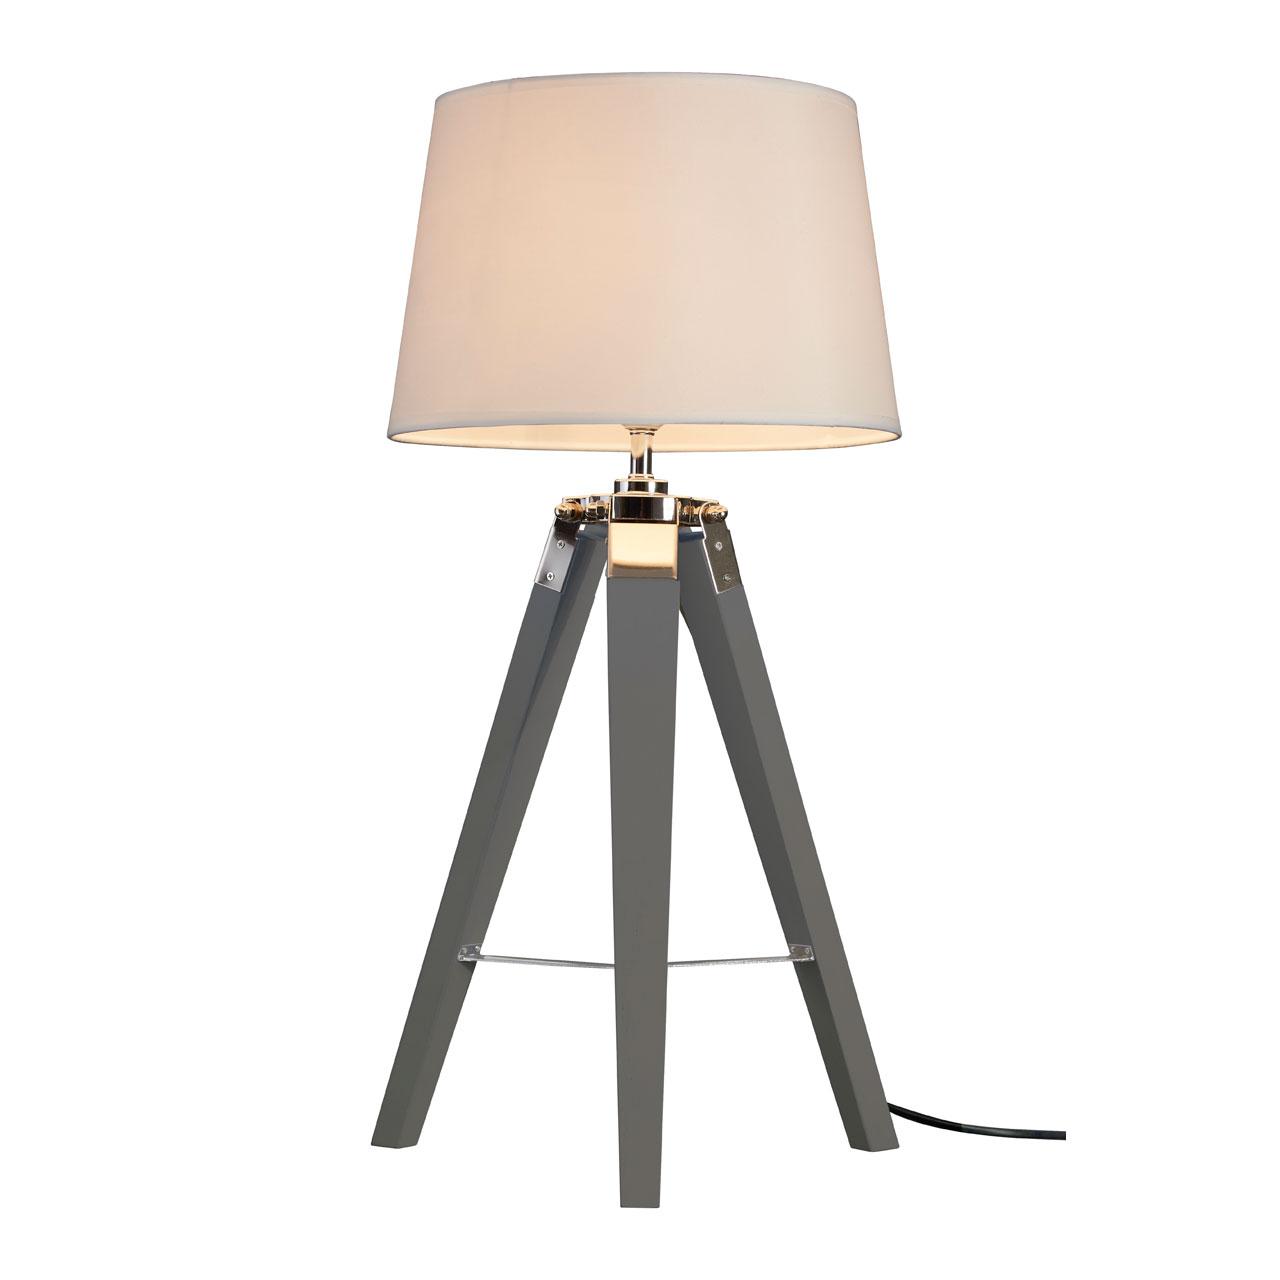 Details About Bailey Table Lamp Grey Tripod Wooden Base Bedside Light Scandinavian Style